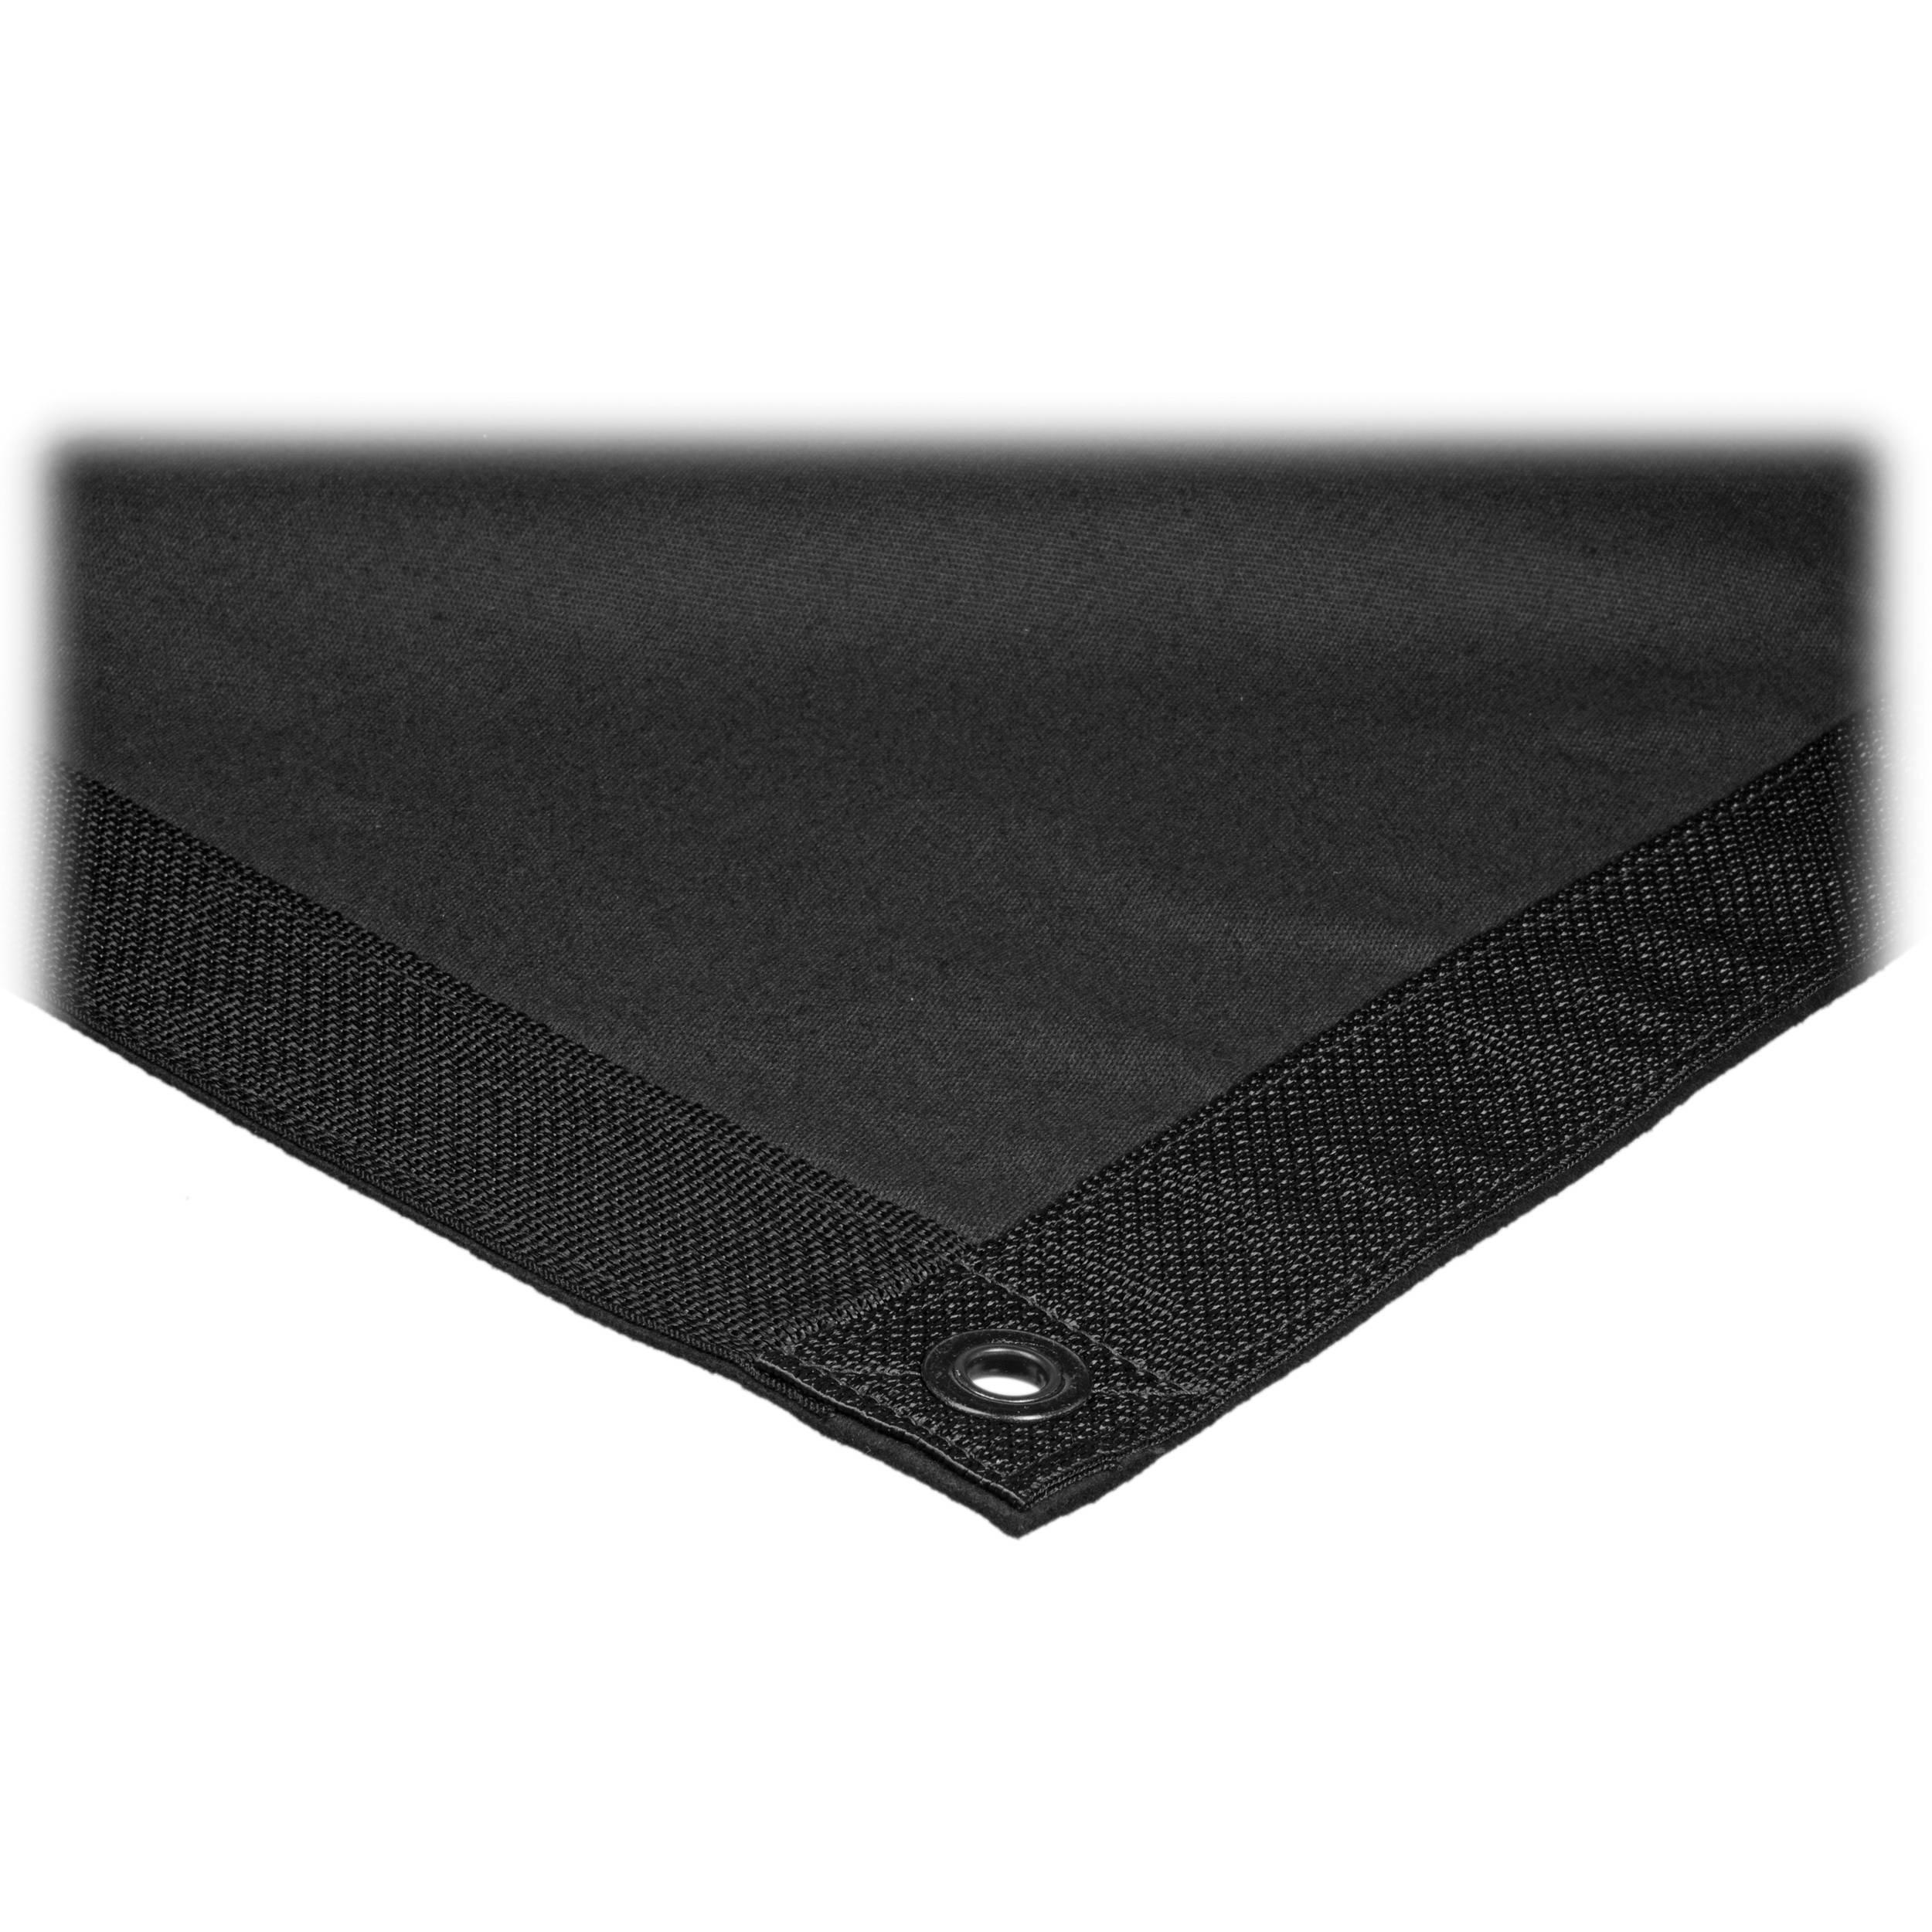 MT319913 20′ x 20′ Waterproof Solid Overhead, Black